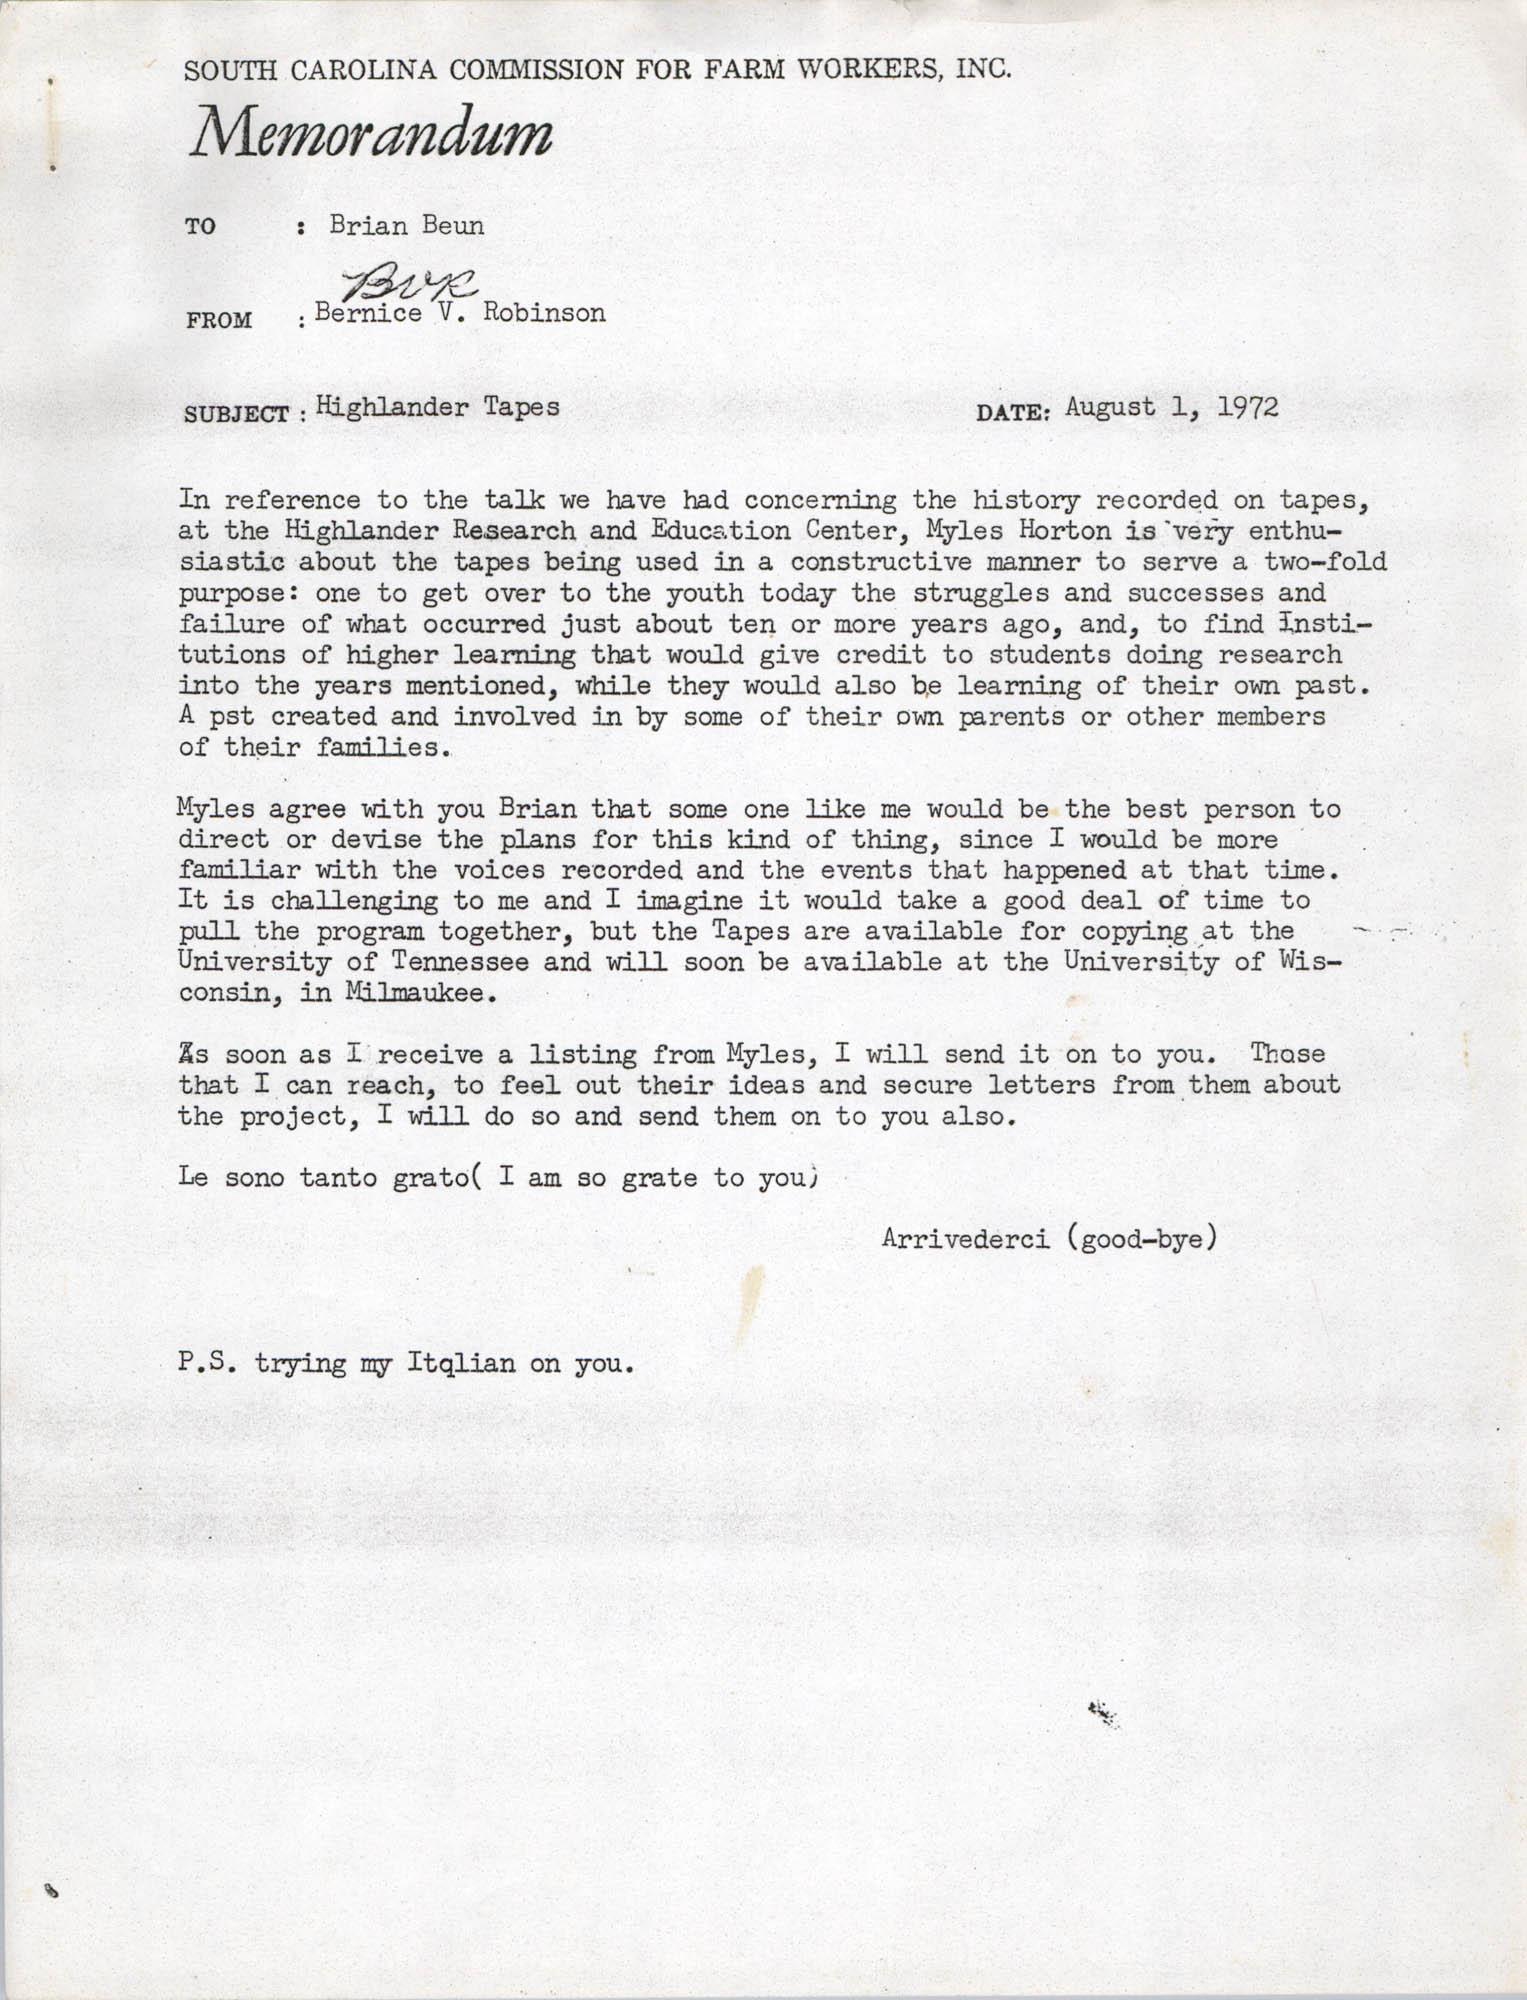 Memorandum from Bernice V. Robinson to Brian Beun, August 1, 1972